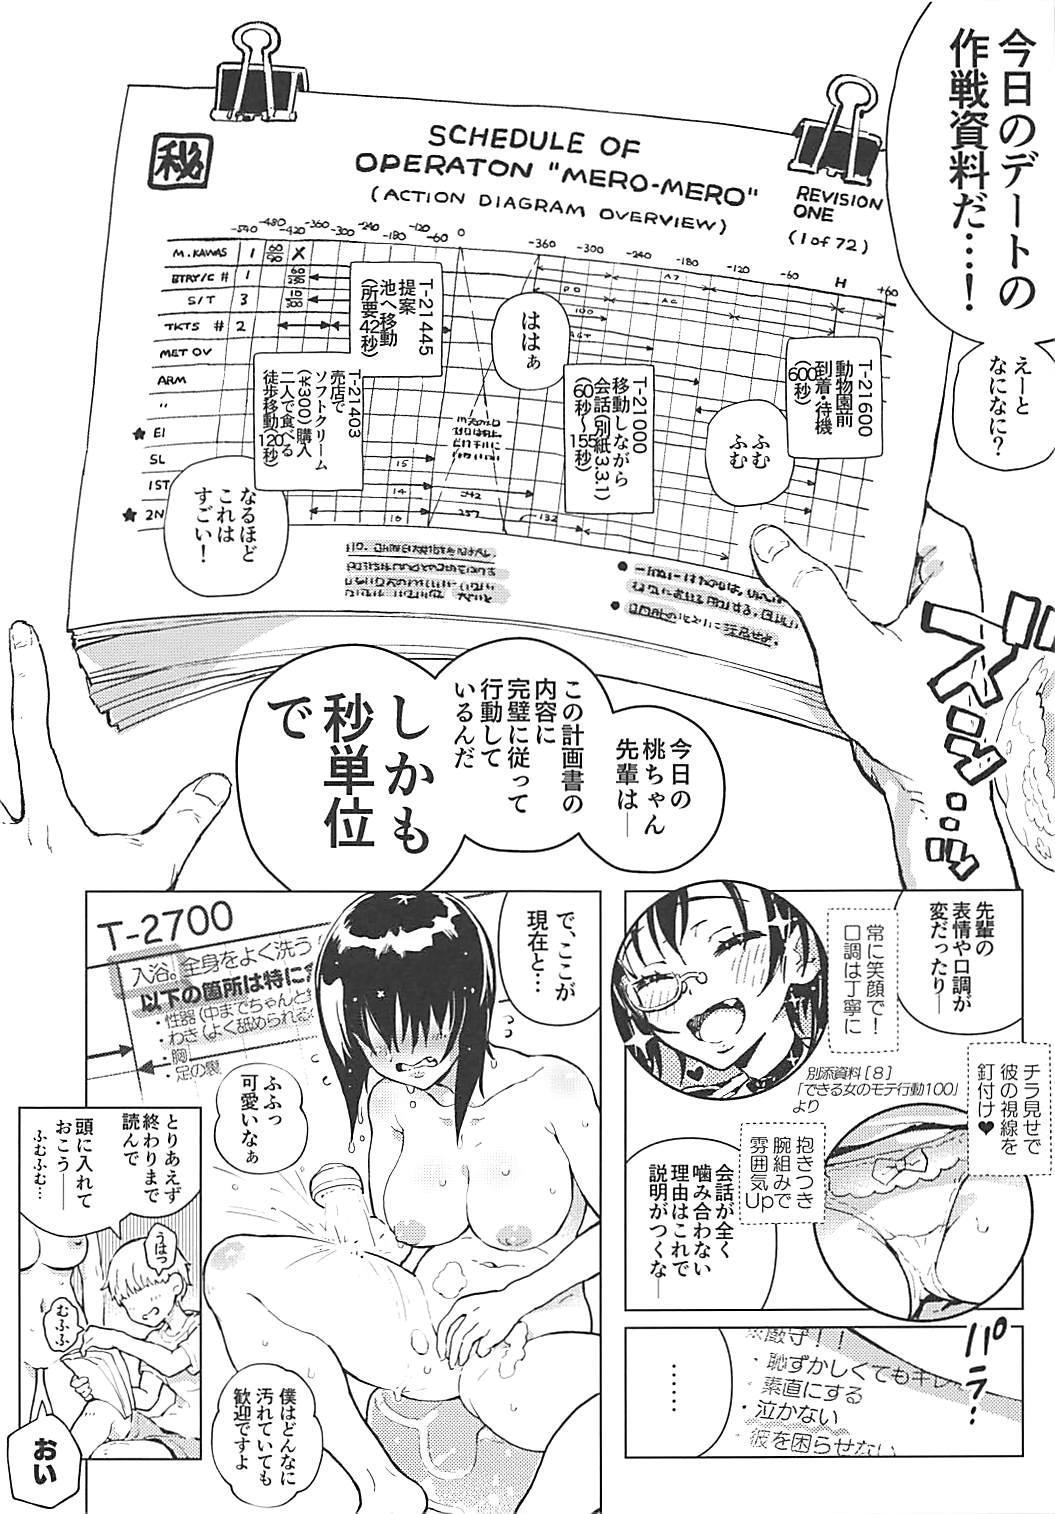 (Panzer Vor! 15) [Norinko] momon 2018-05 Hisshou Momo-chan Senpai no Perfect Date Plan (Girls und Panzer) 4